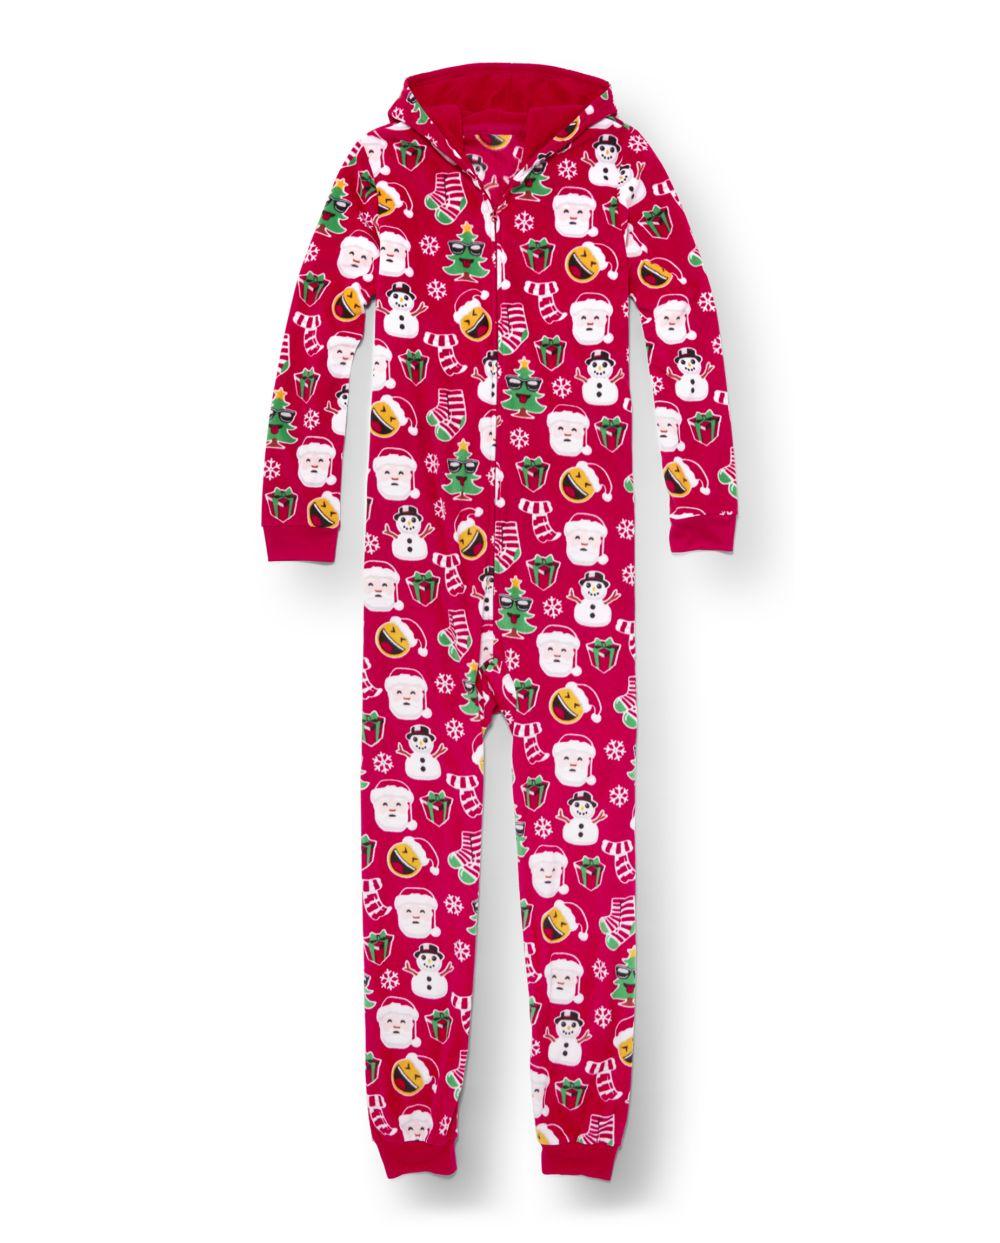 Unisex Adult Matching Family Long Sleeve Christmas Emoji Print Fleece Hooded One Piece Pajamas